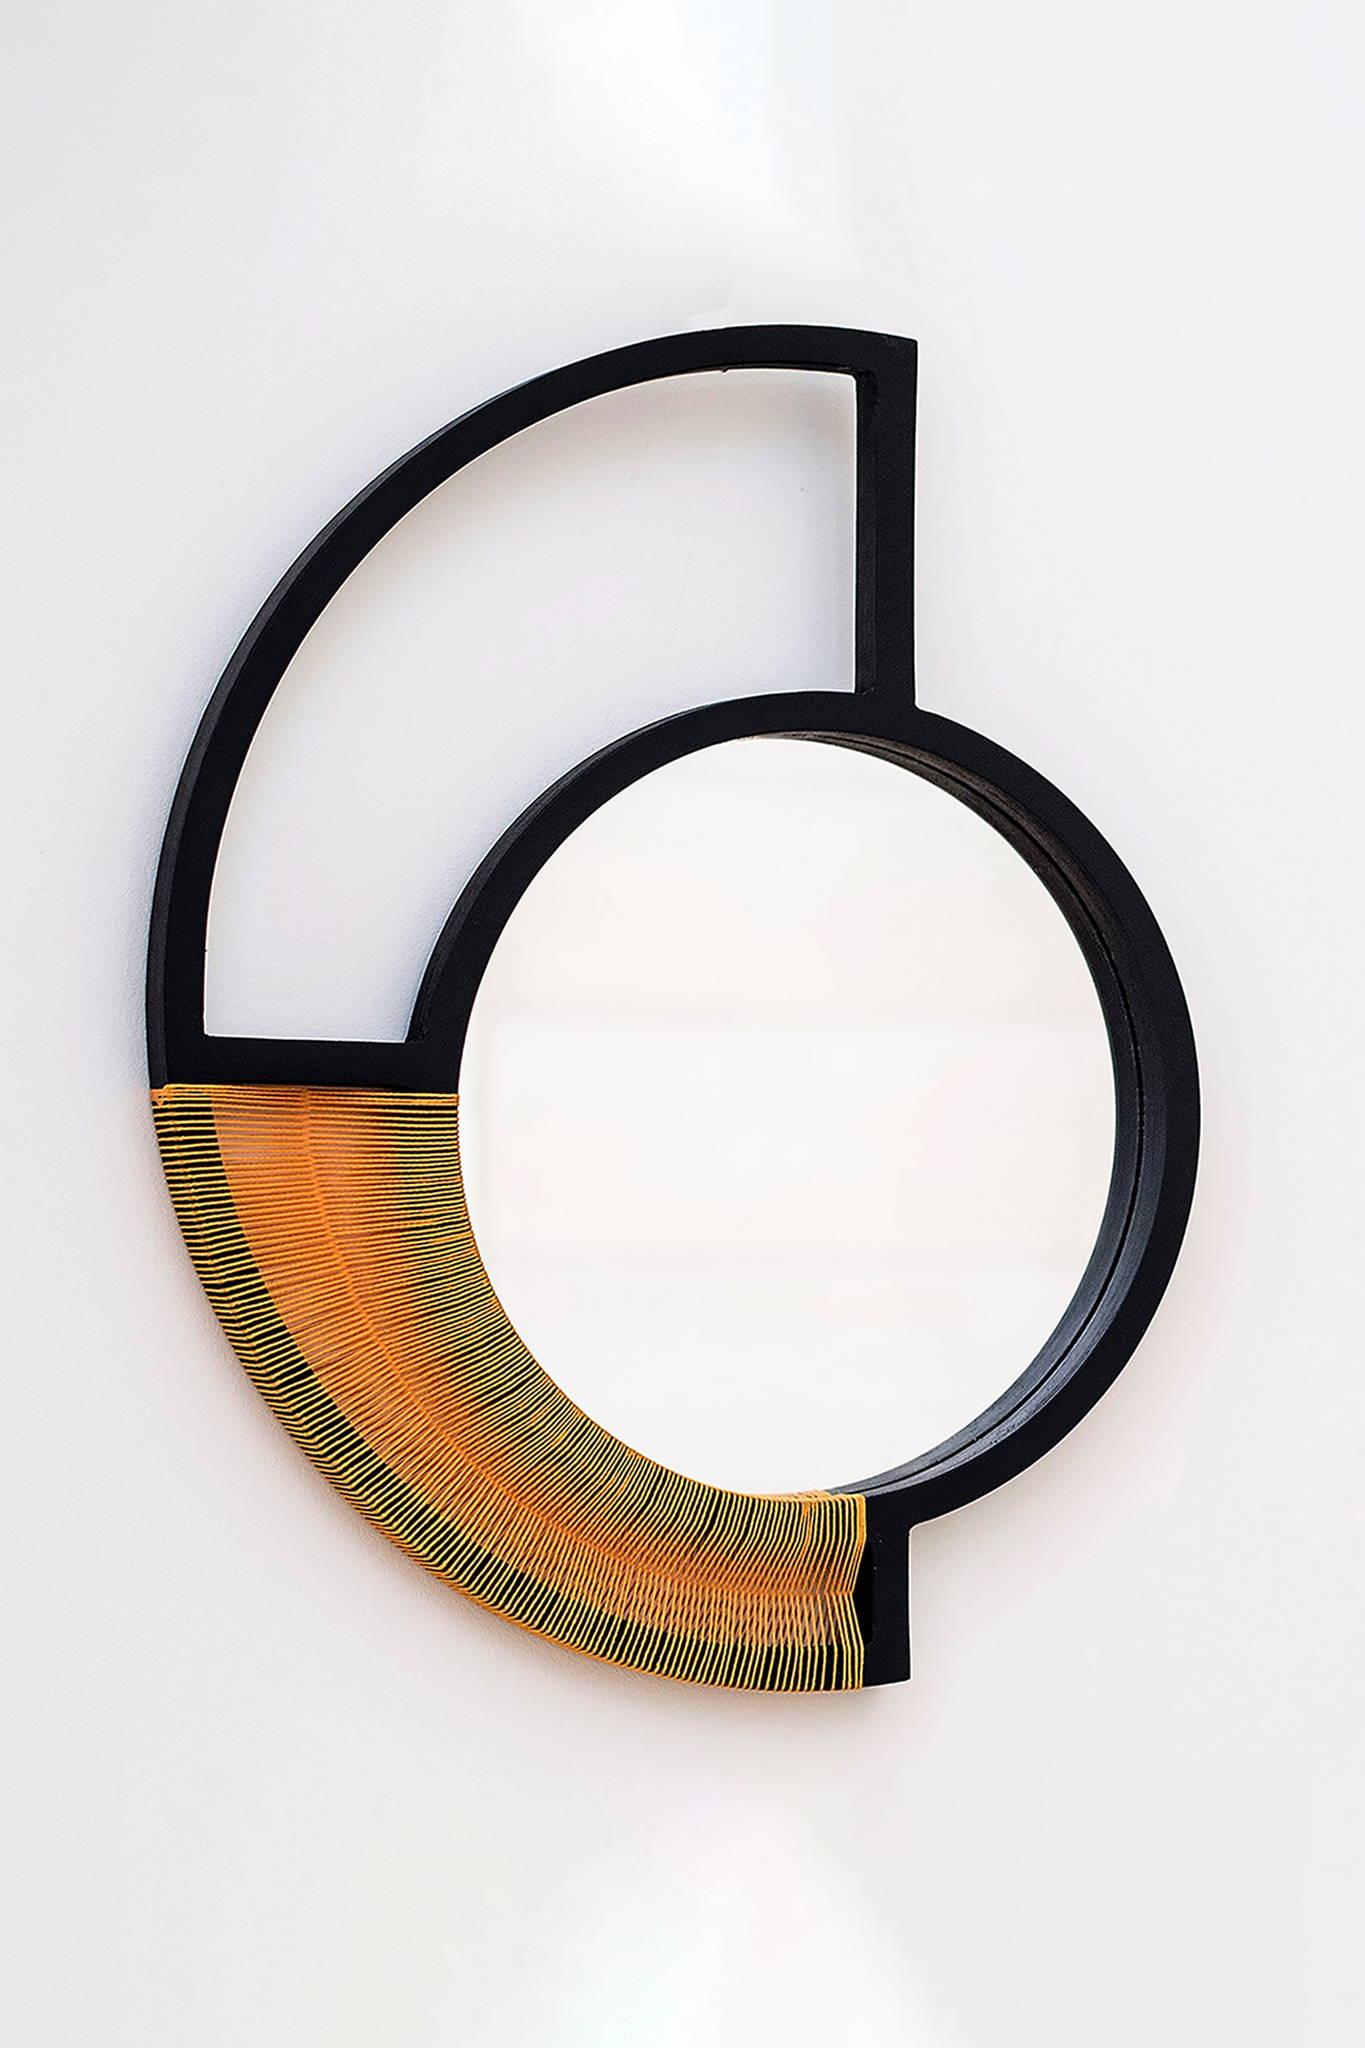 WOVEN MIRROR ARTWORK - YELLOW $ 275